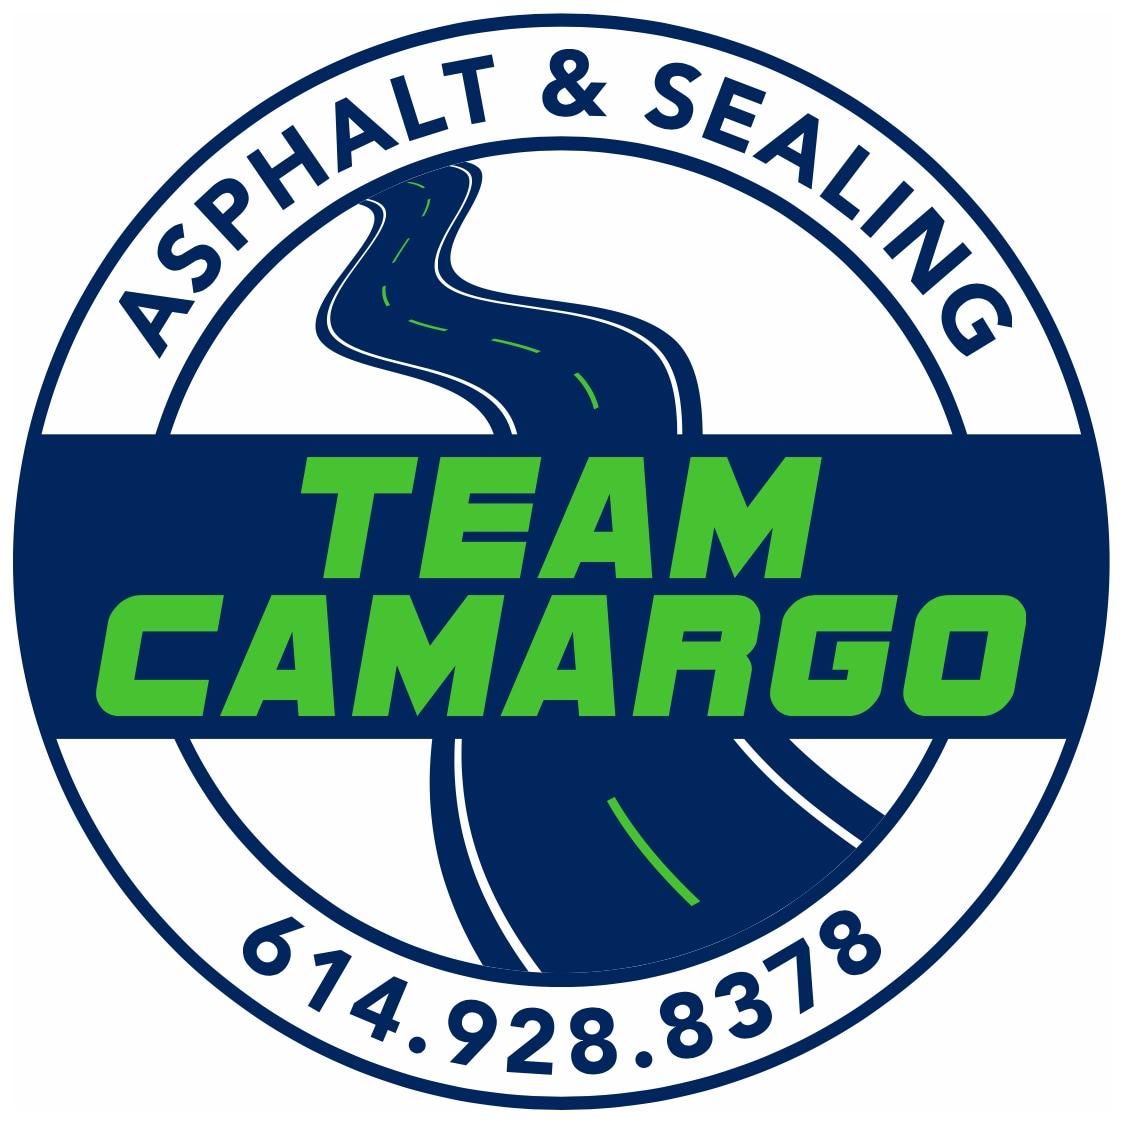 Team Camargo asphalt and sealing